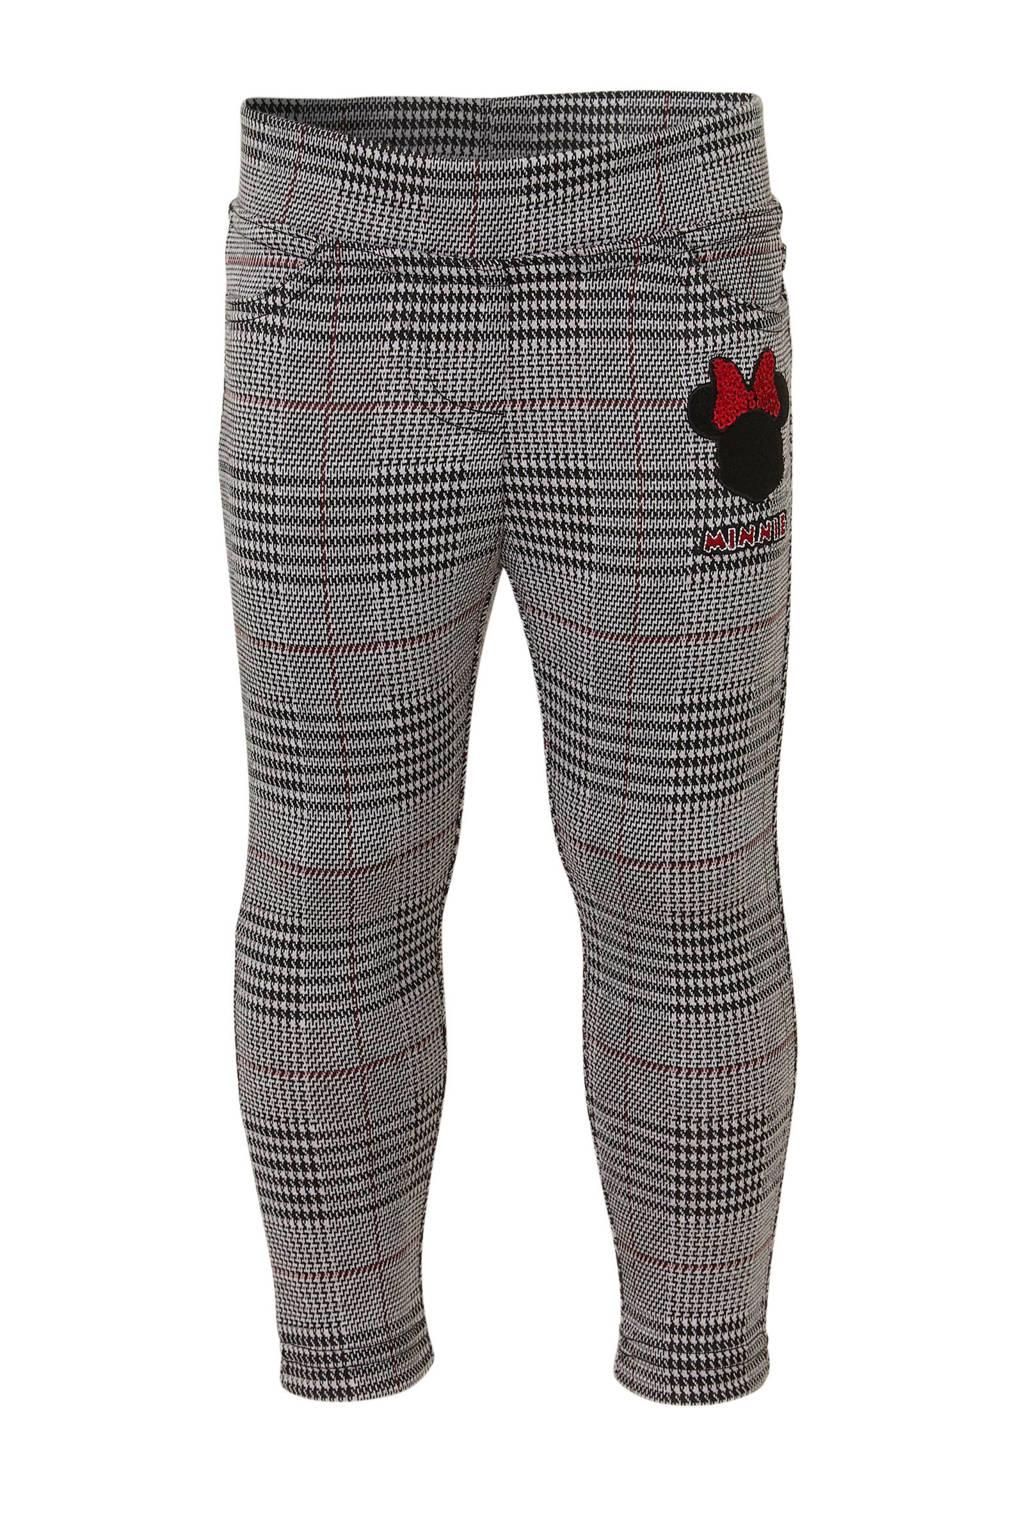 Disney @ C&A geruite legging antraciet/ rood, Antraciet/ Rood